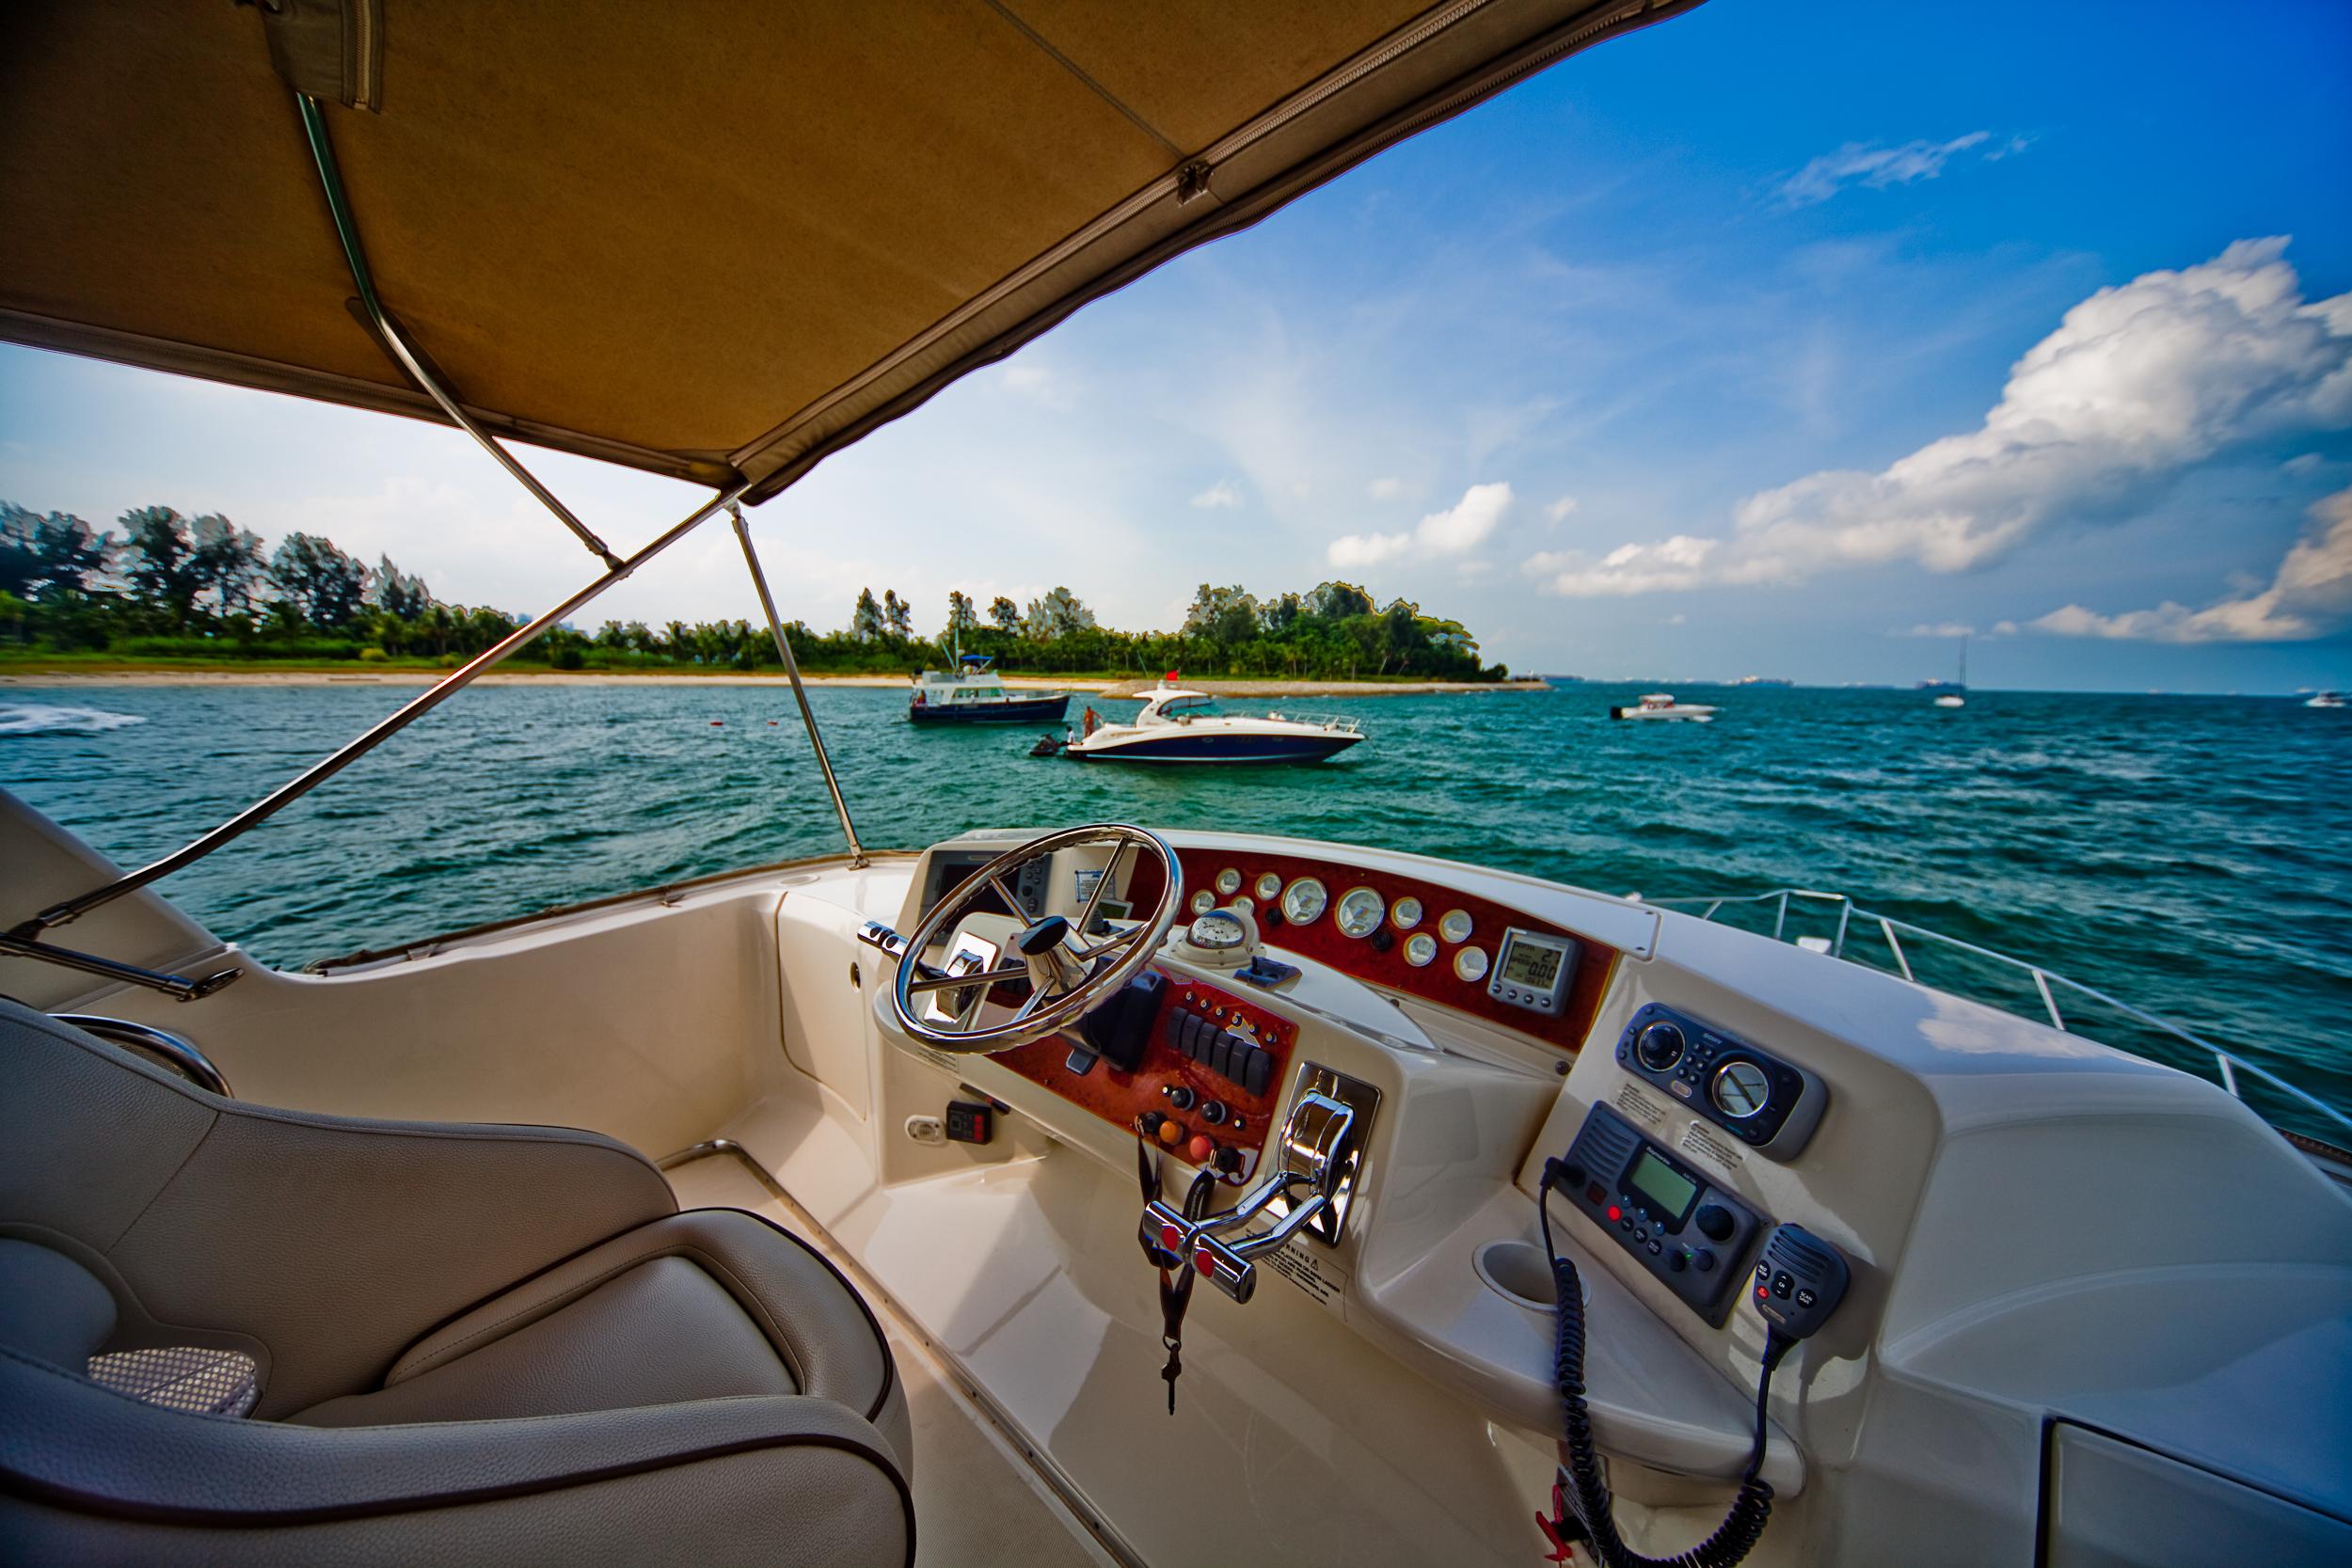 yacht charter service around singapore